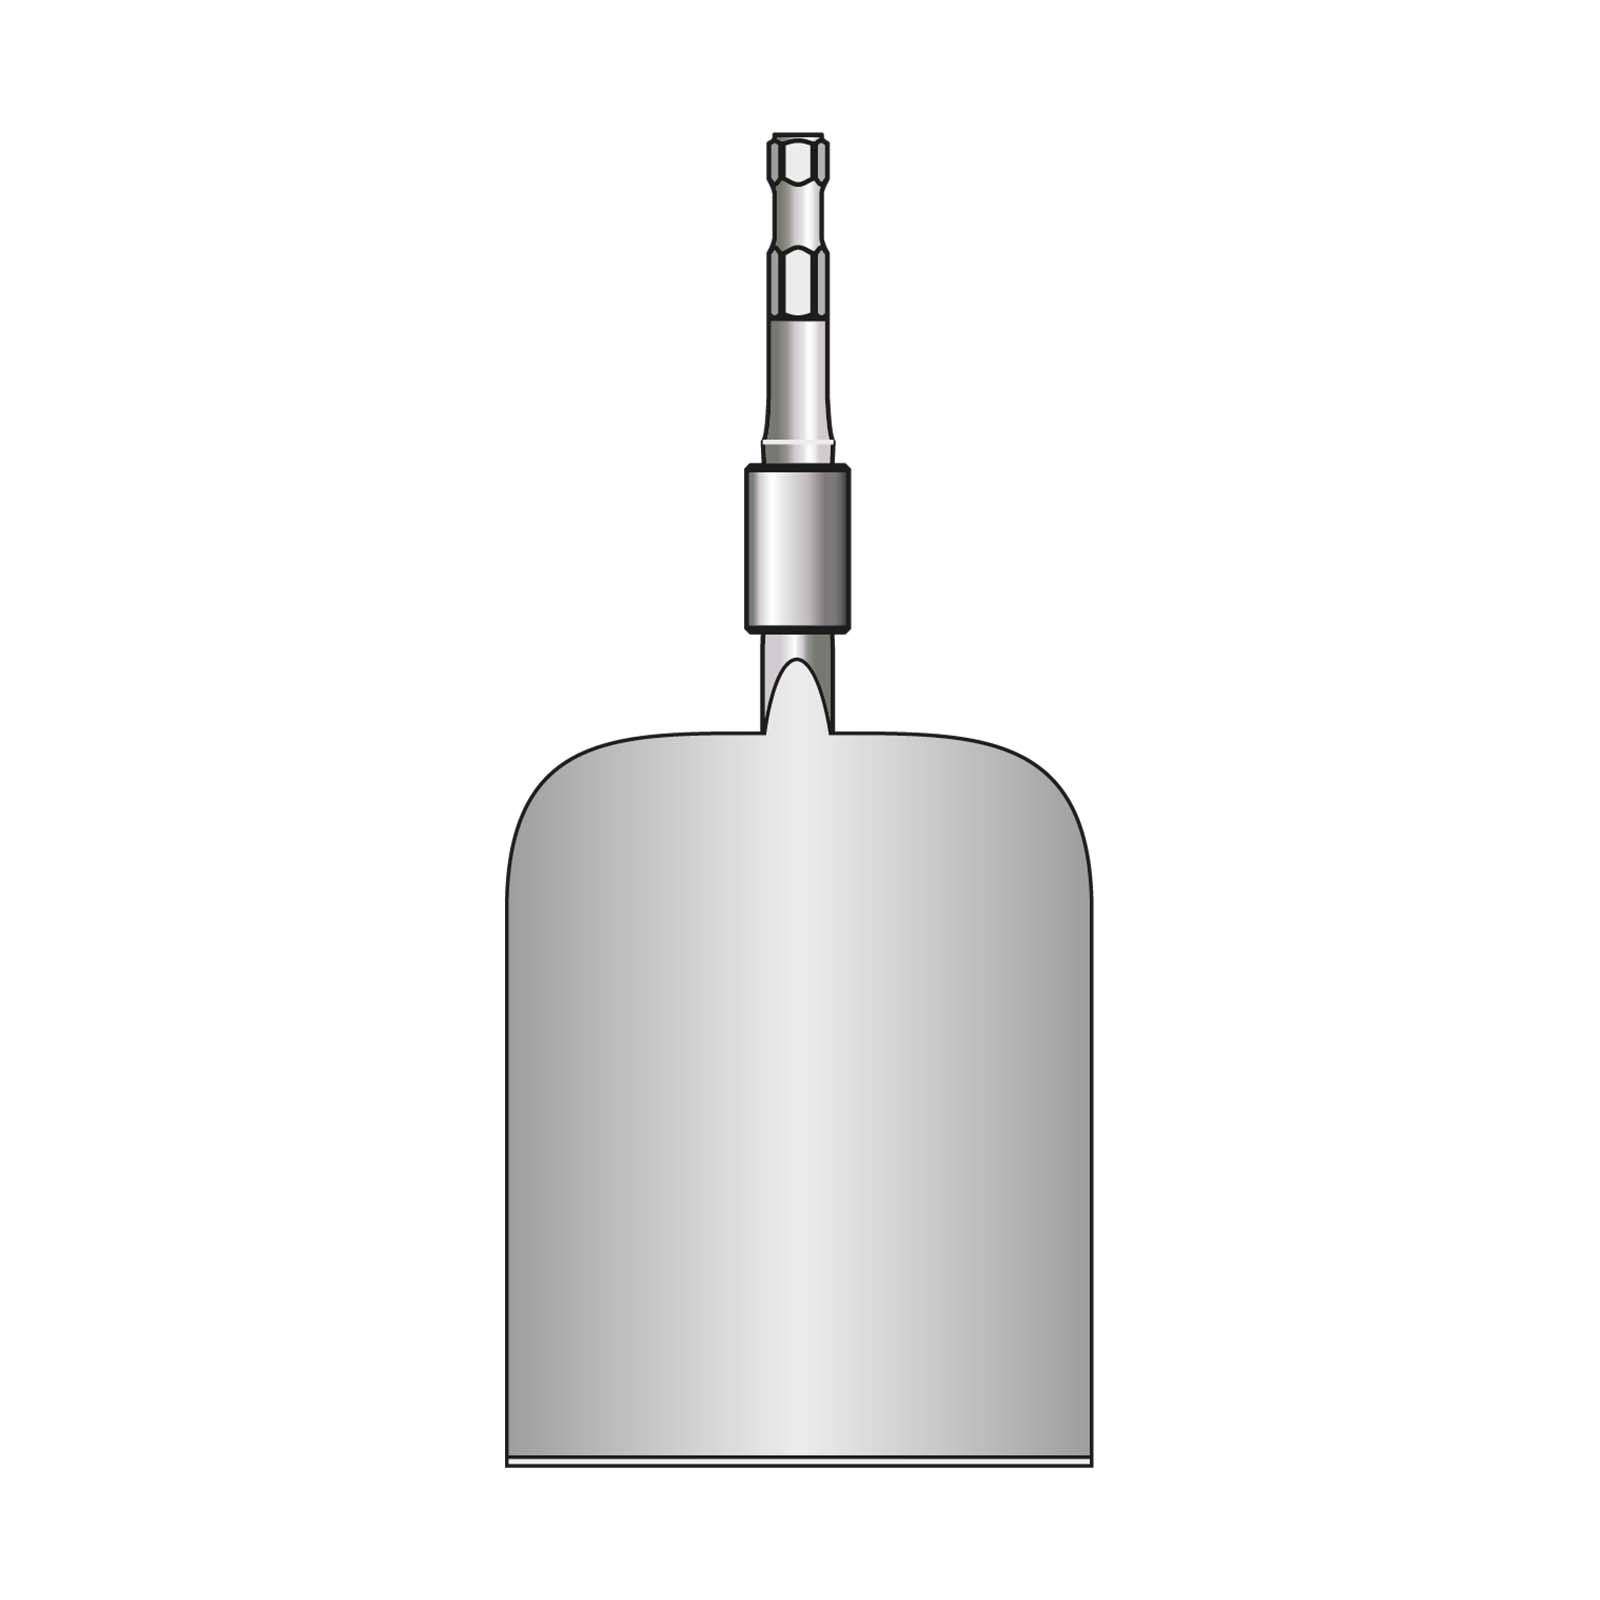 VOGT Tonspaten b = 85/120 mm, l = 470 mm